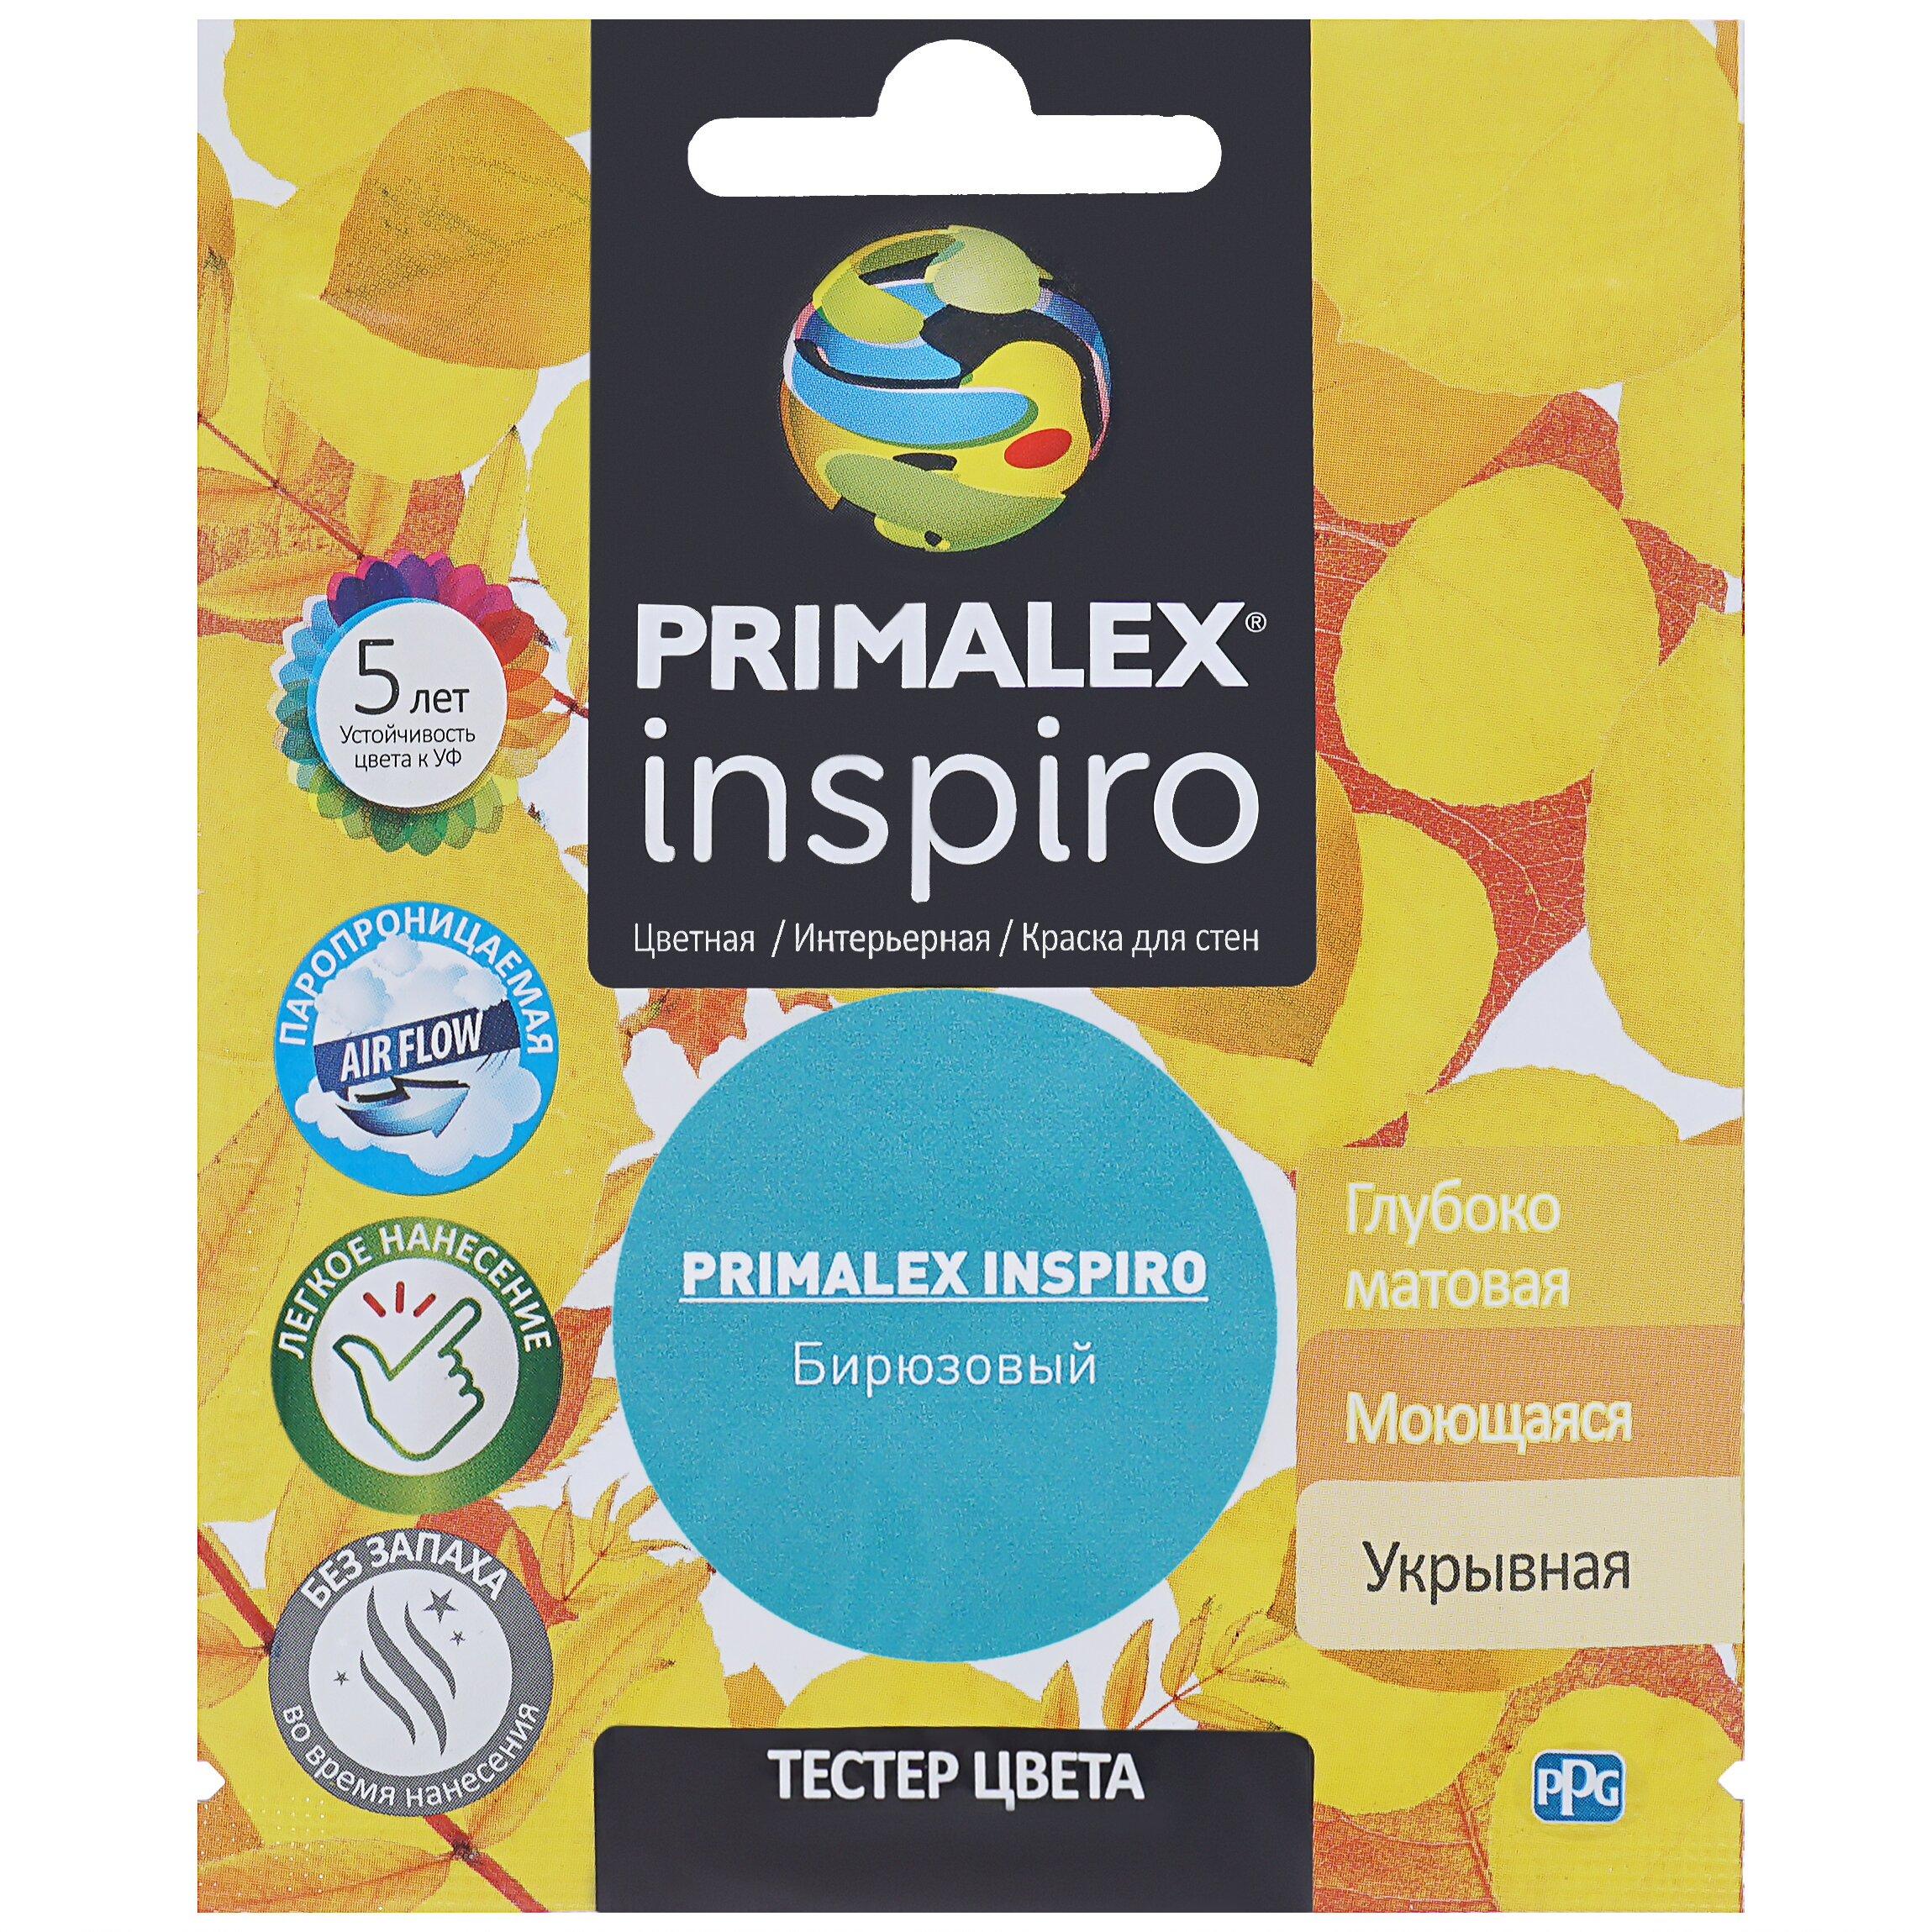 Краска Primalex Inspiro Бирюзовый 40мл краска ppg primalex inspiro красный мак 40мл pmx i47